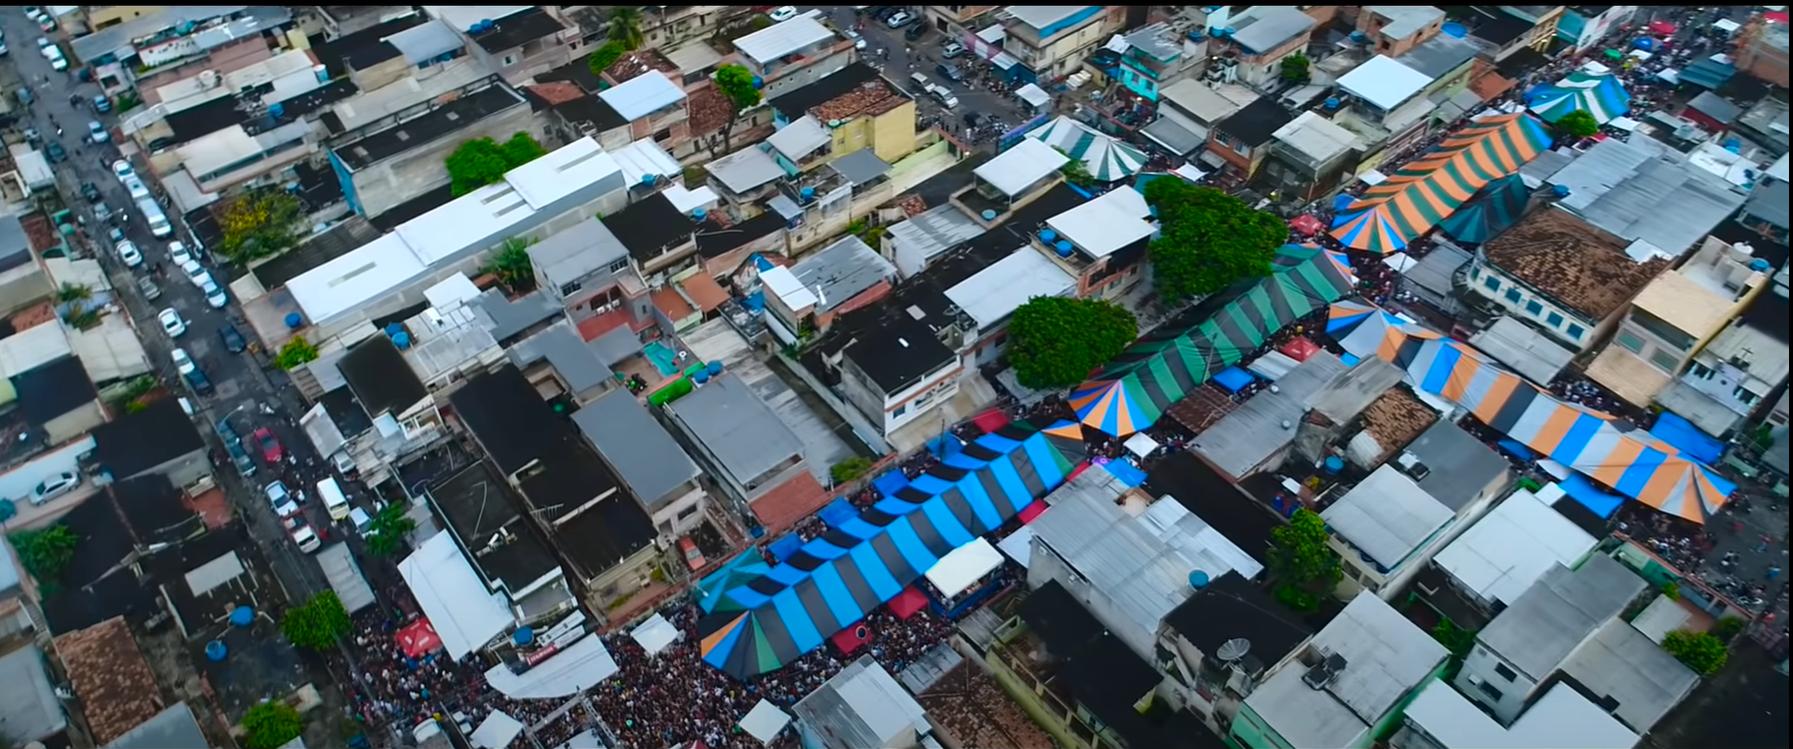 A Chave da Gaiola: O Funk Como a Arte Libertadora de Corpos na Favela  [PODCAST] - RioOnWatch